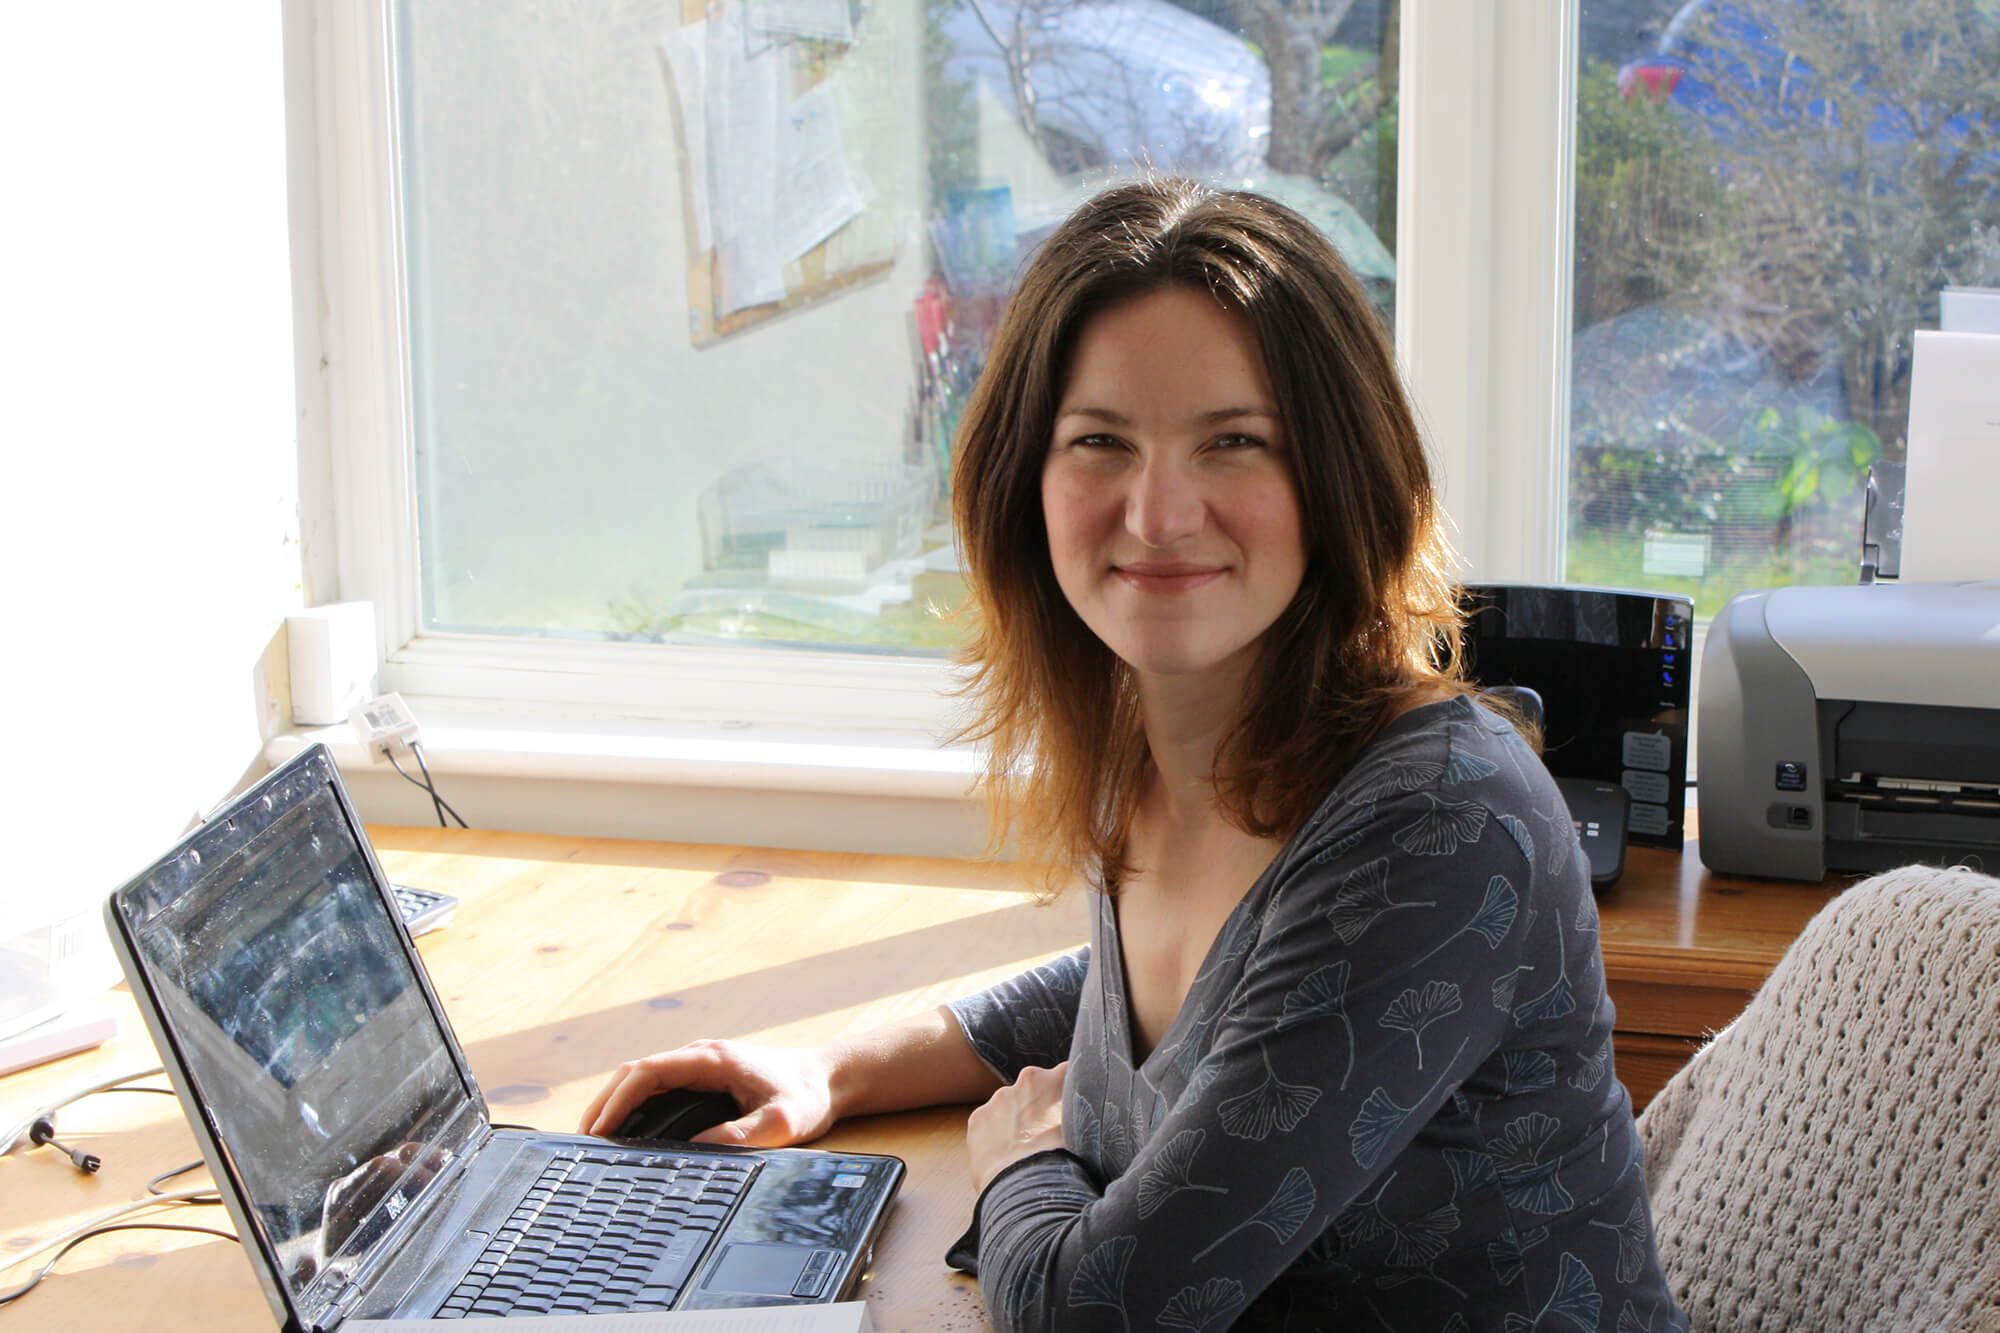 Joy Rickard working at her laptop